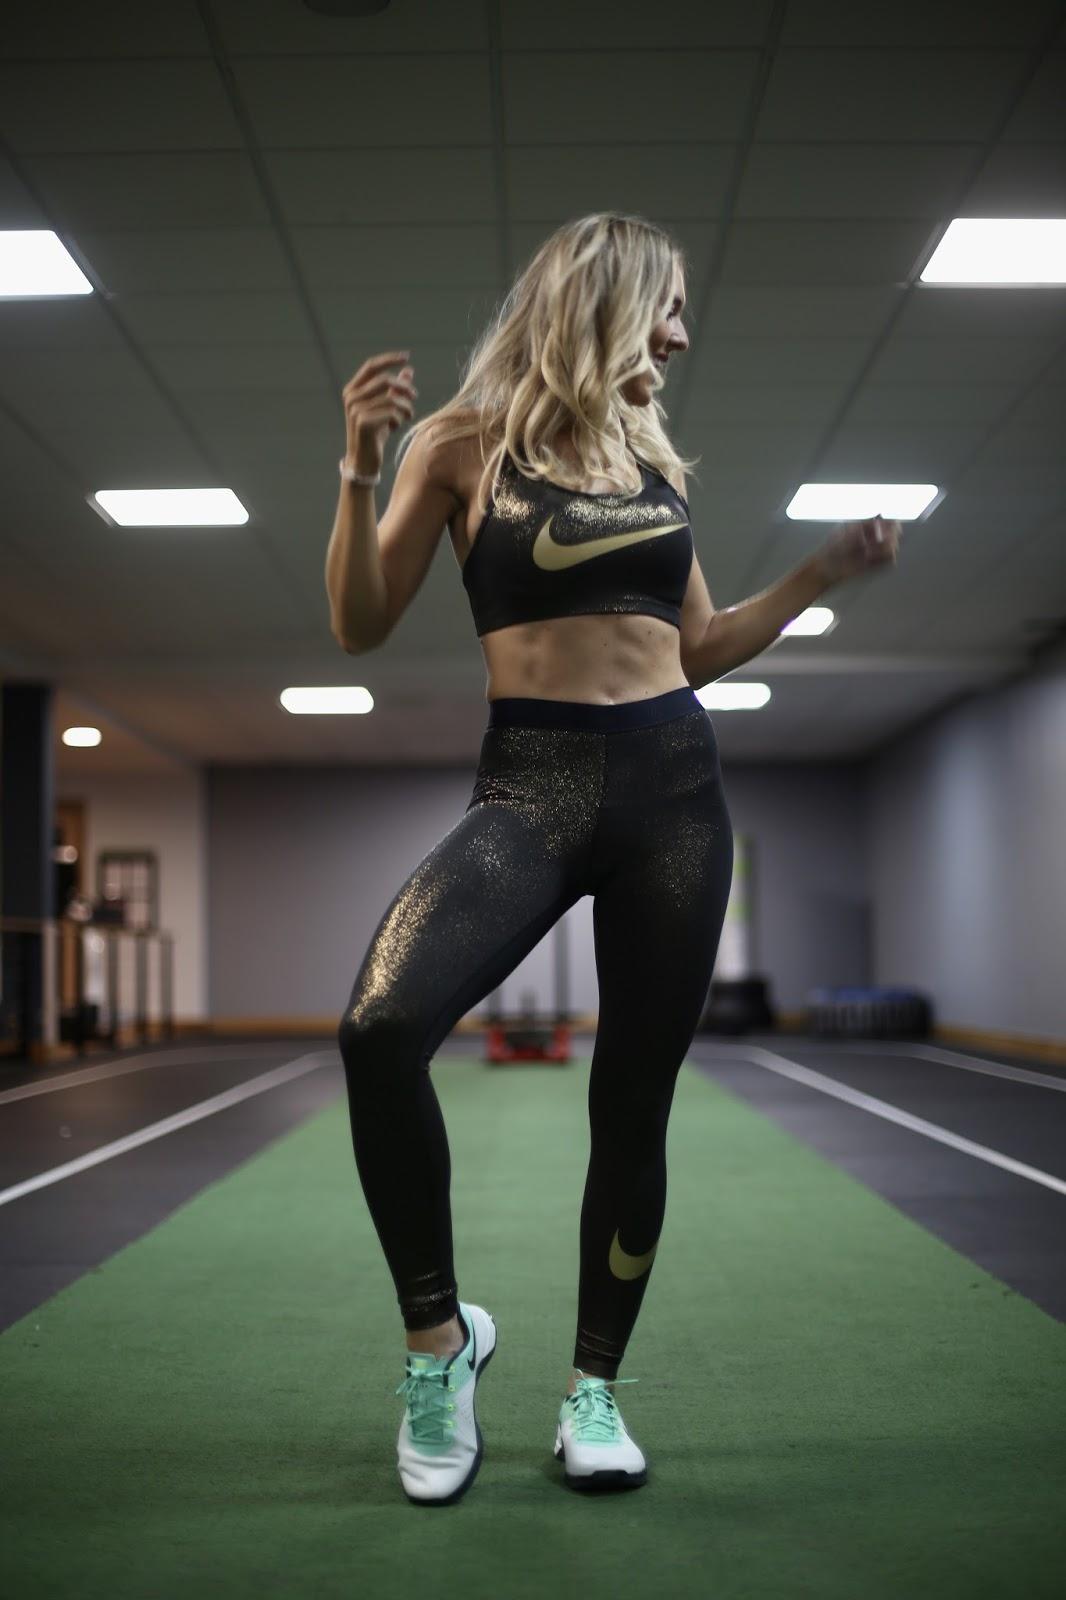 nike sparkly gym kit